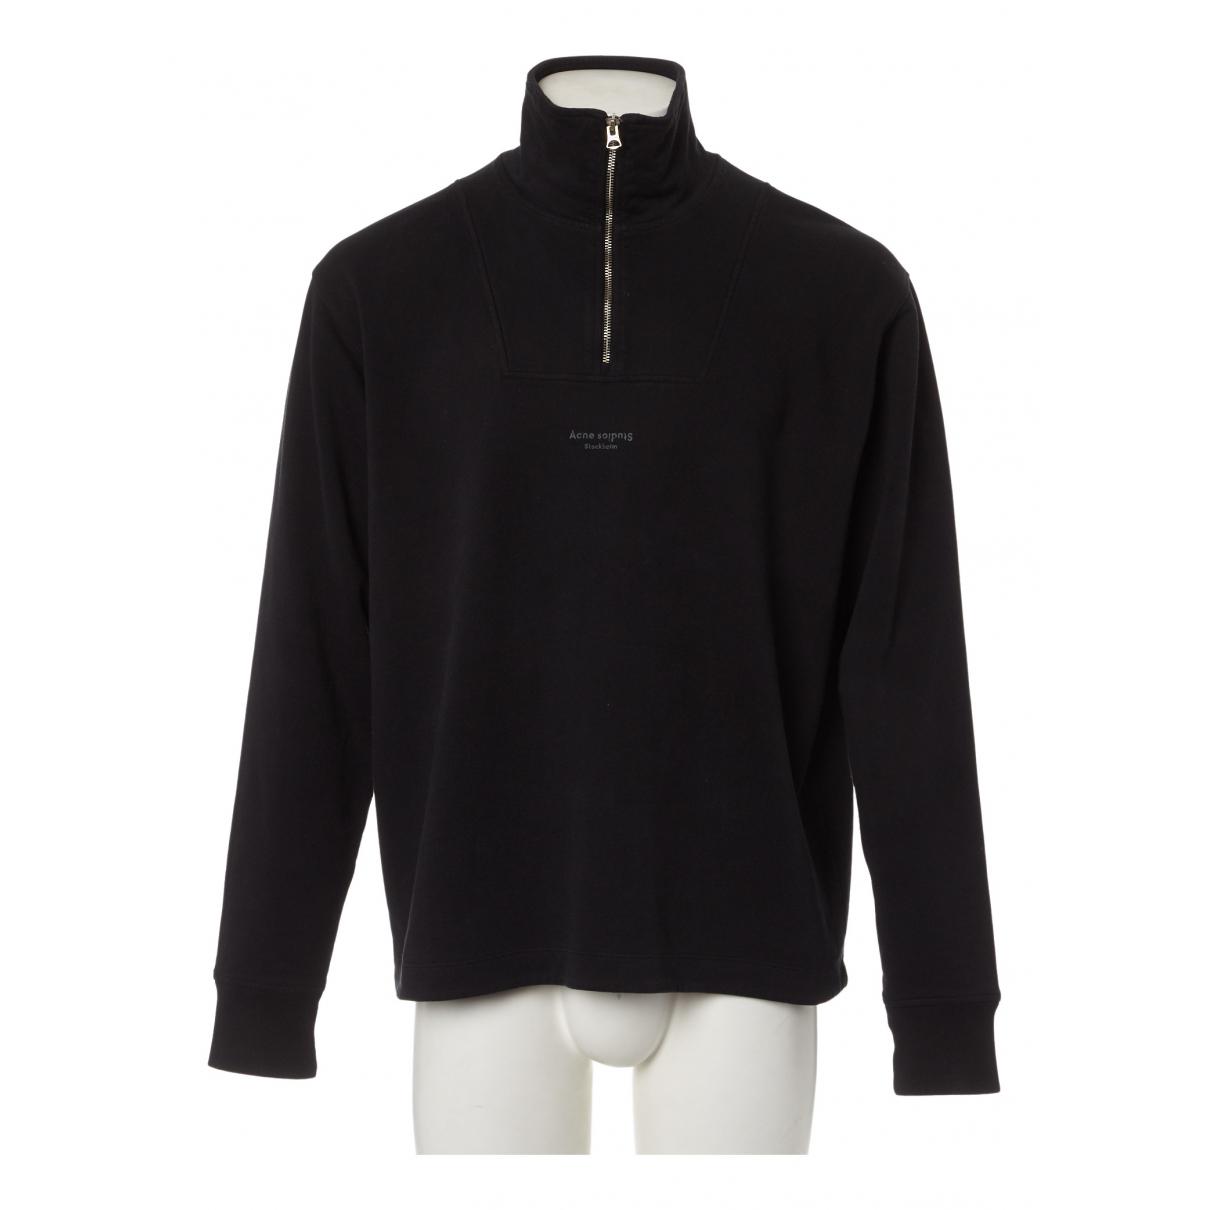 Acne Studios N Black Cotton Knitwear & Sweatshirts for Men S International